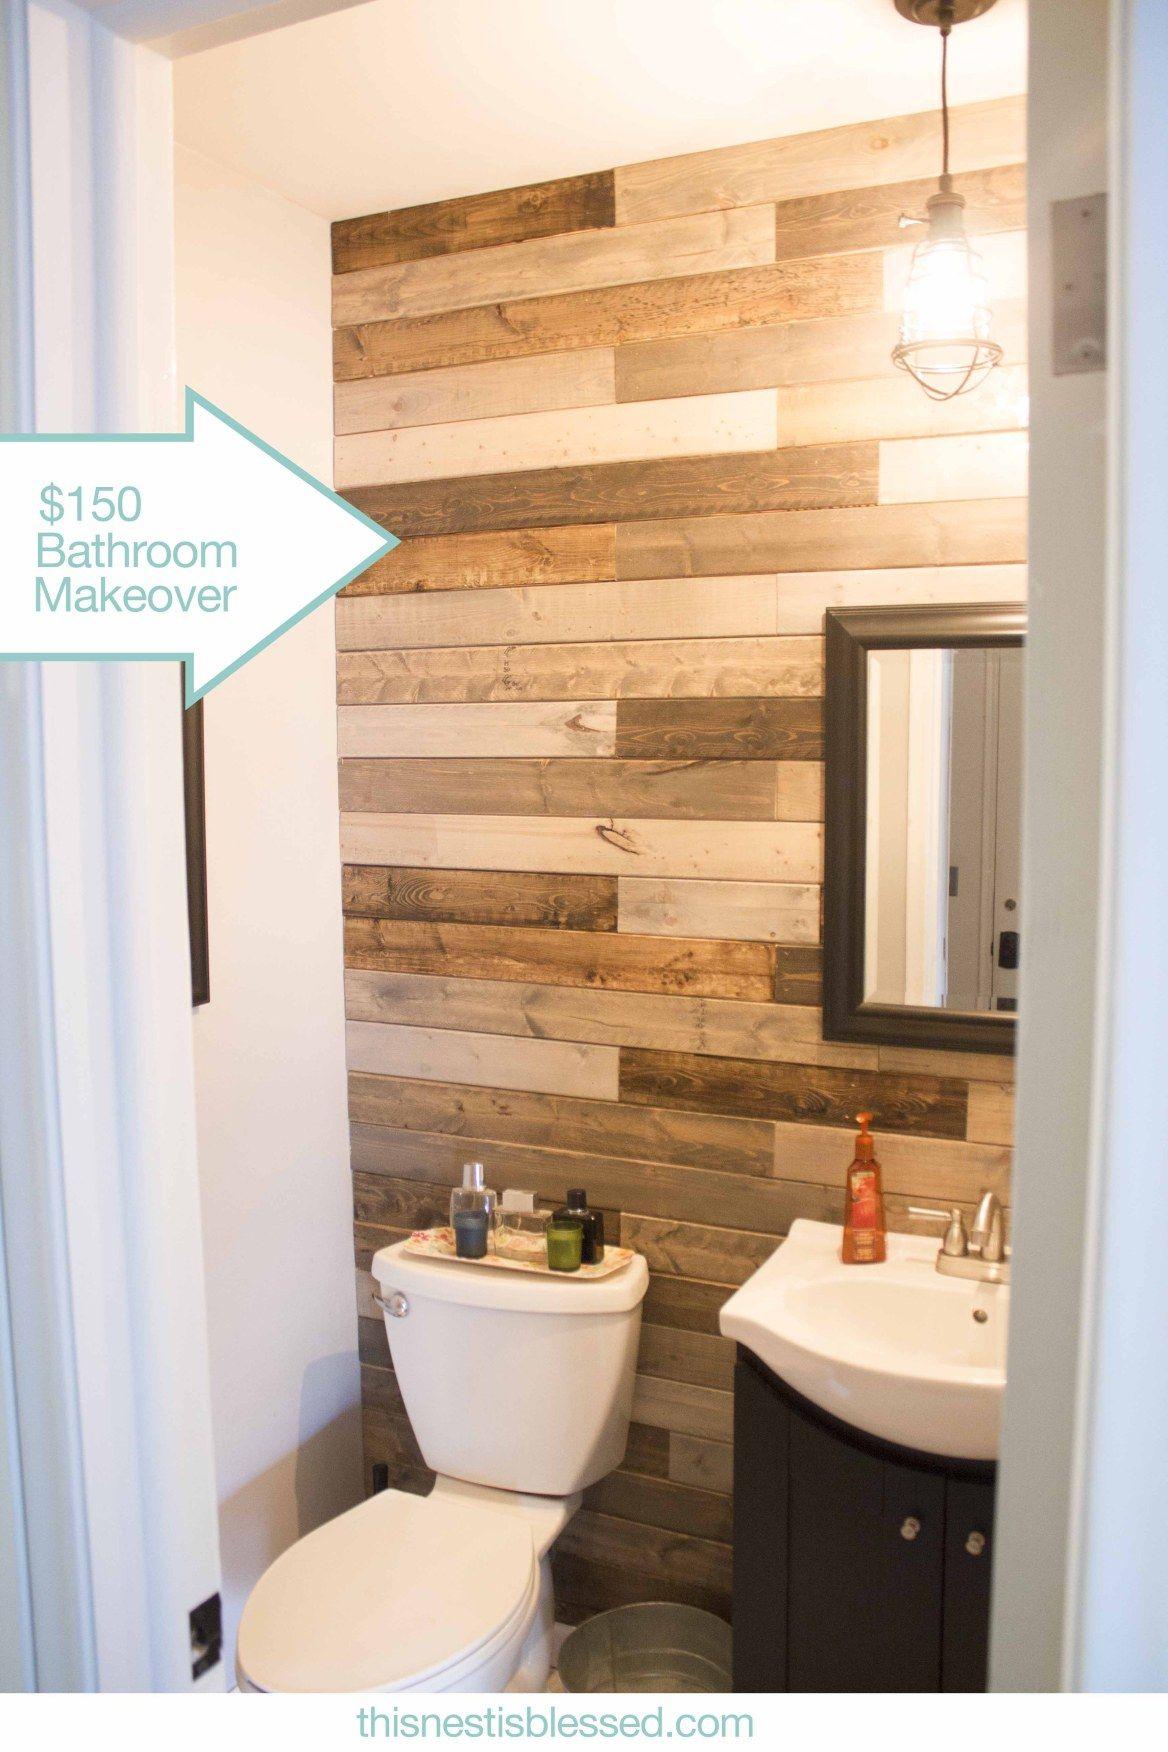 Bathroom Plank Wall Home Remodeling Diy Pallet Wall Renovation